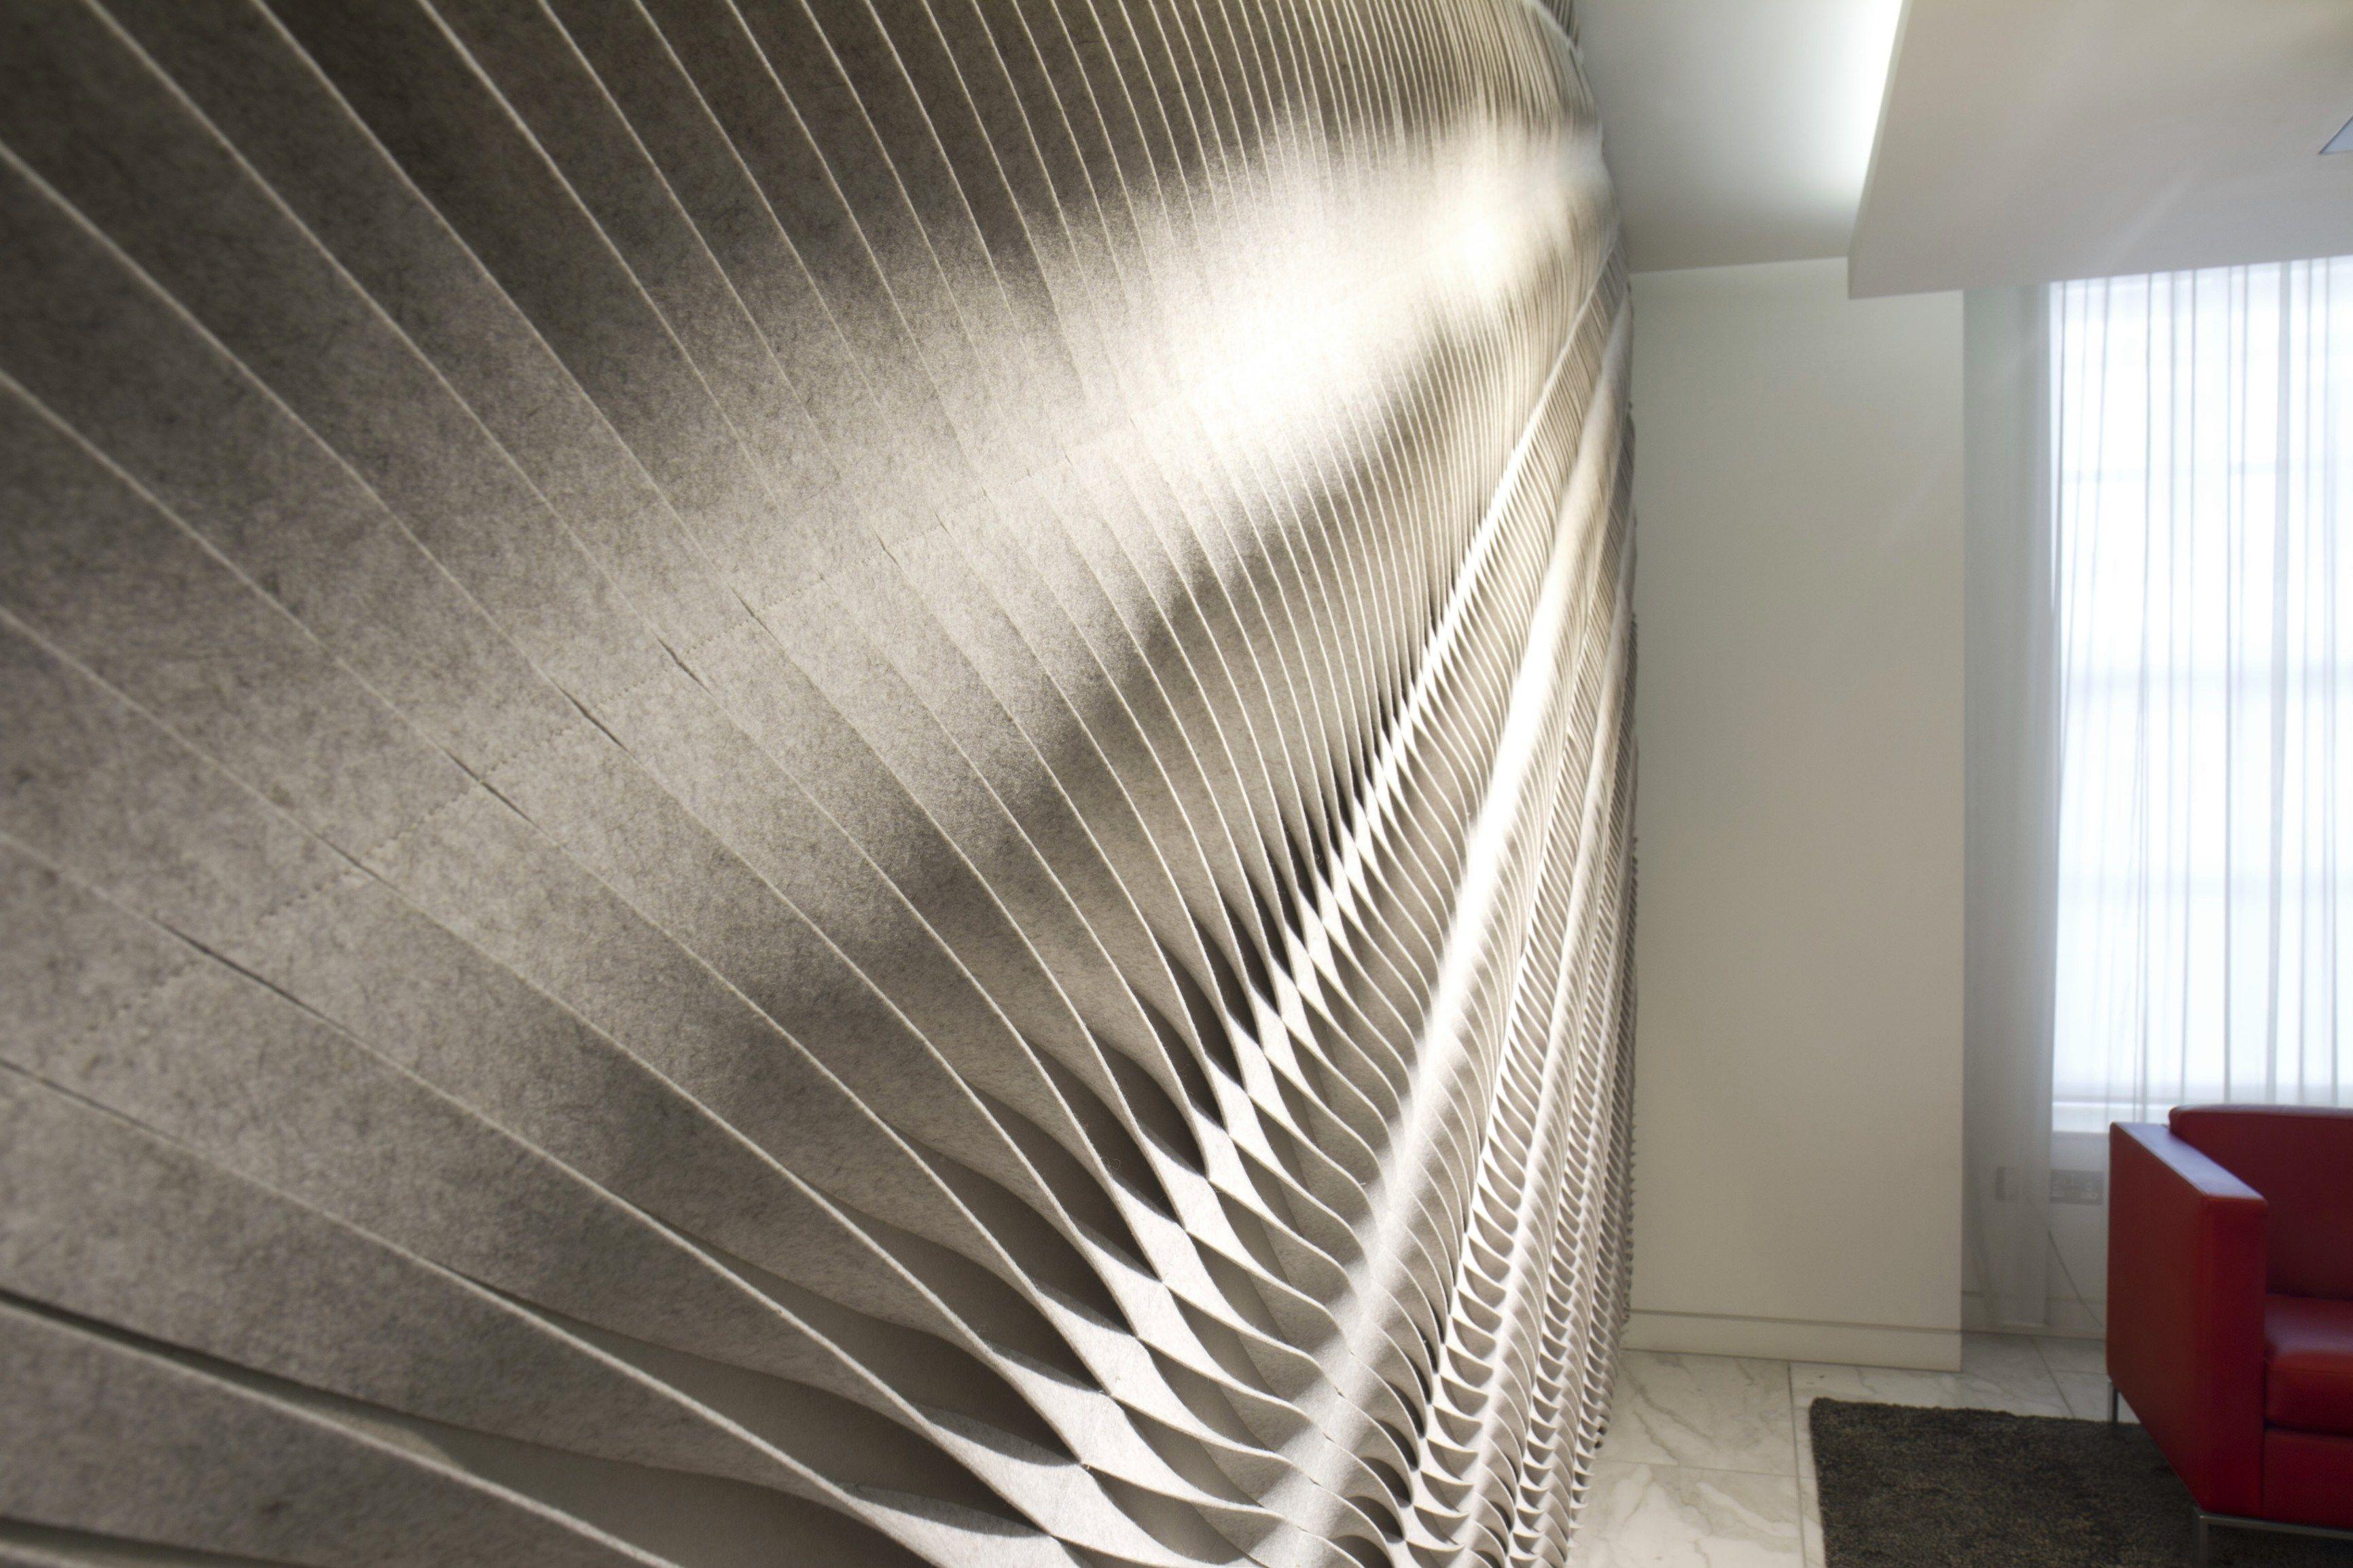 Leaf Fabric Decorative Acoustical Panel By Anne Kyyr 246